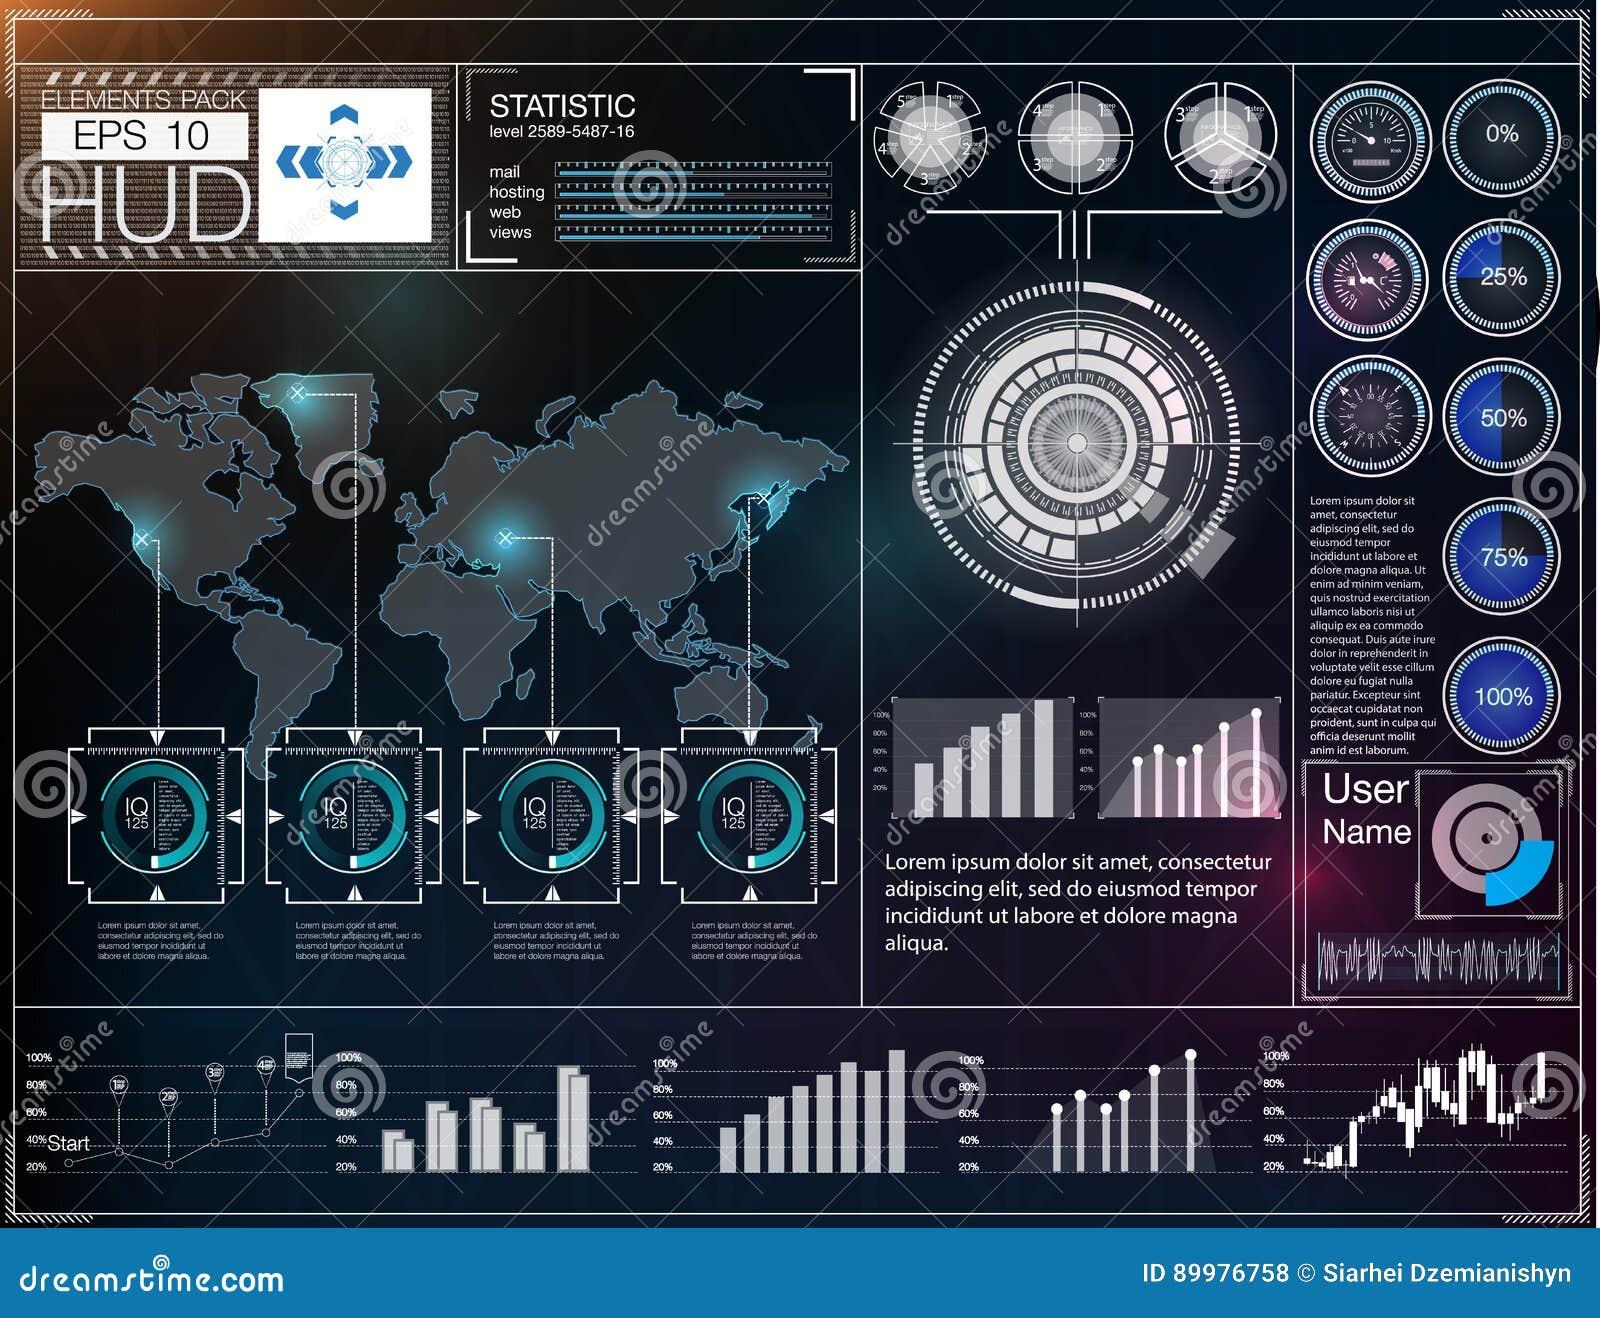 Futuristisch gebruikersinterface HUD UI Abstract virtueel grafisch aanrakingsgebruikersinterface Hud achtergrondkosmische ruimte